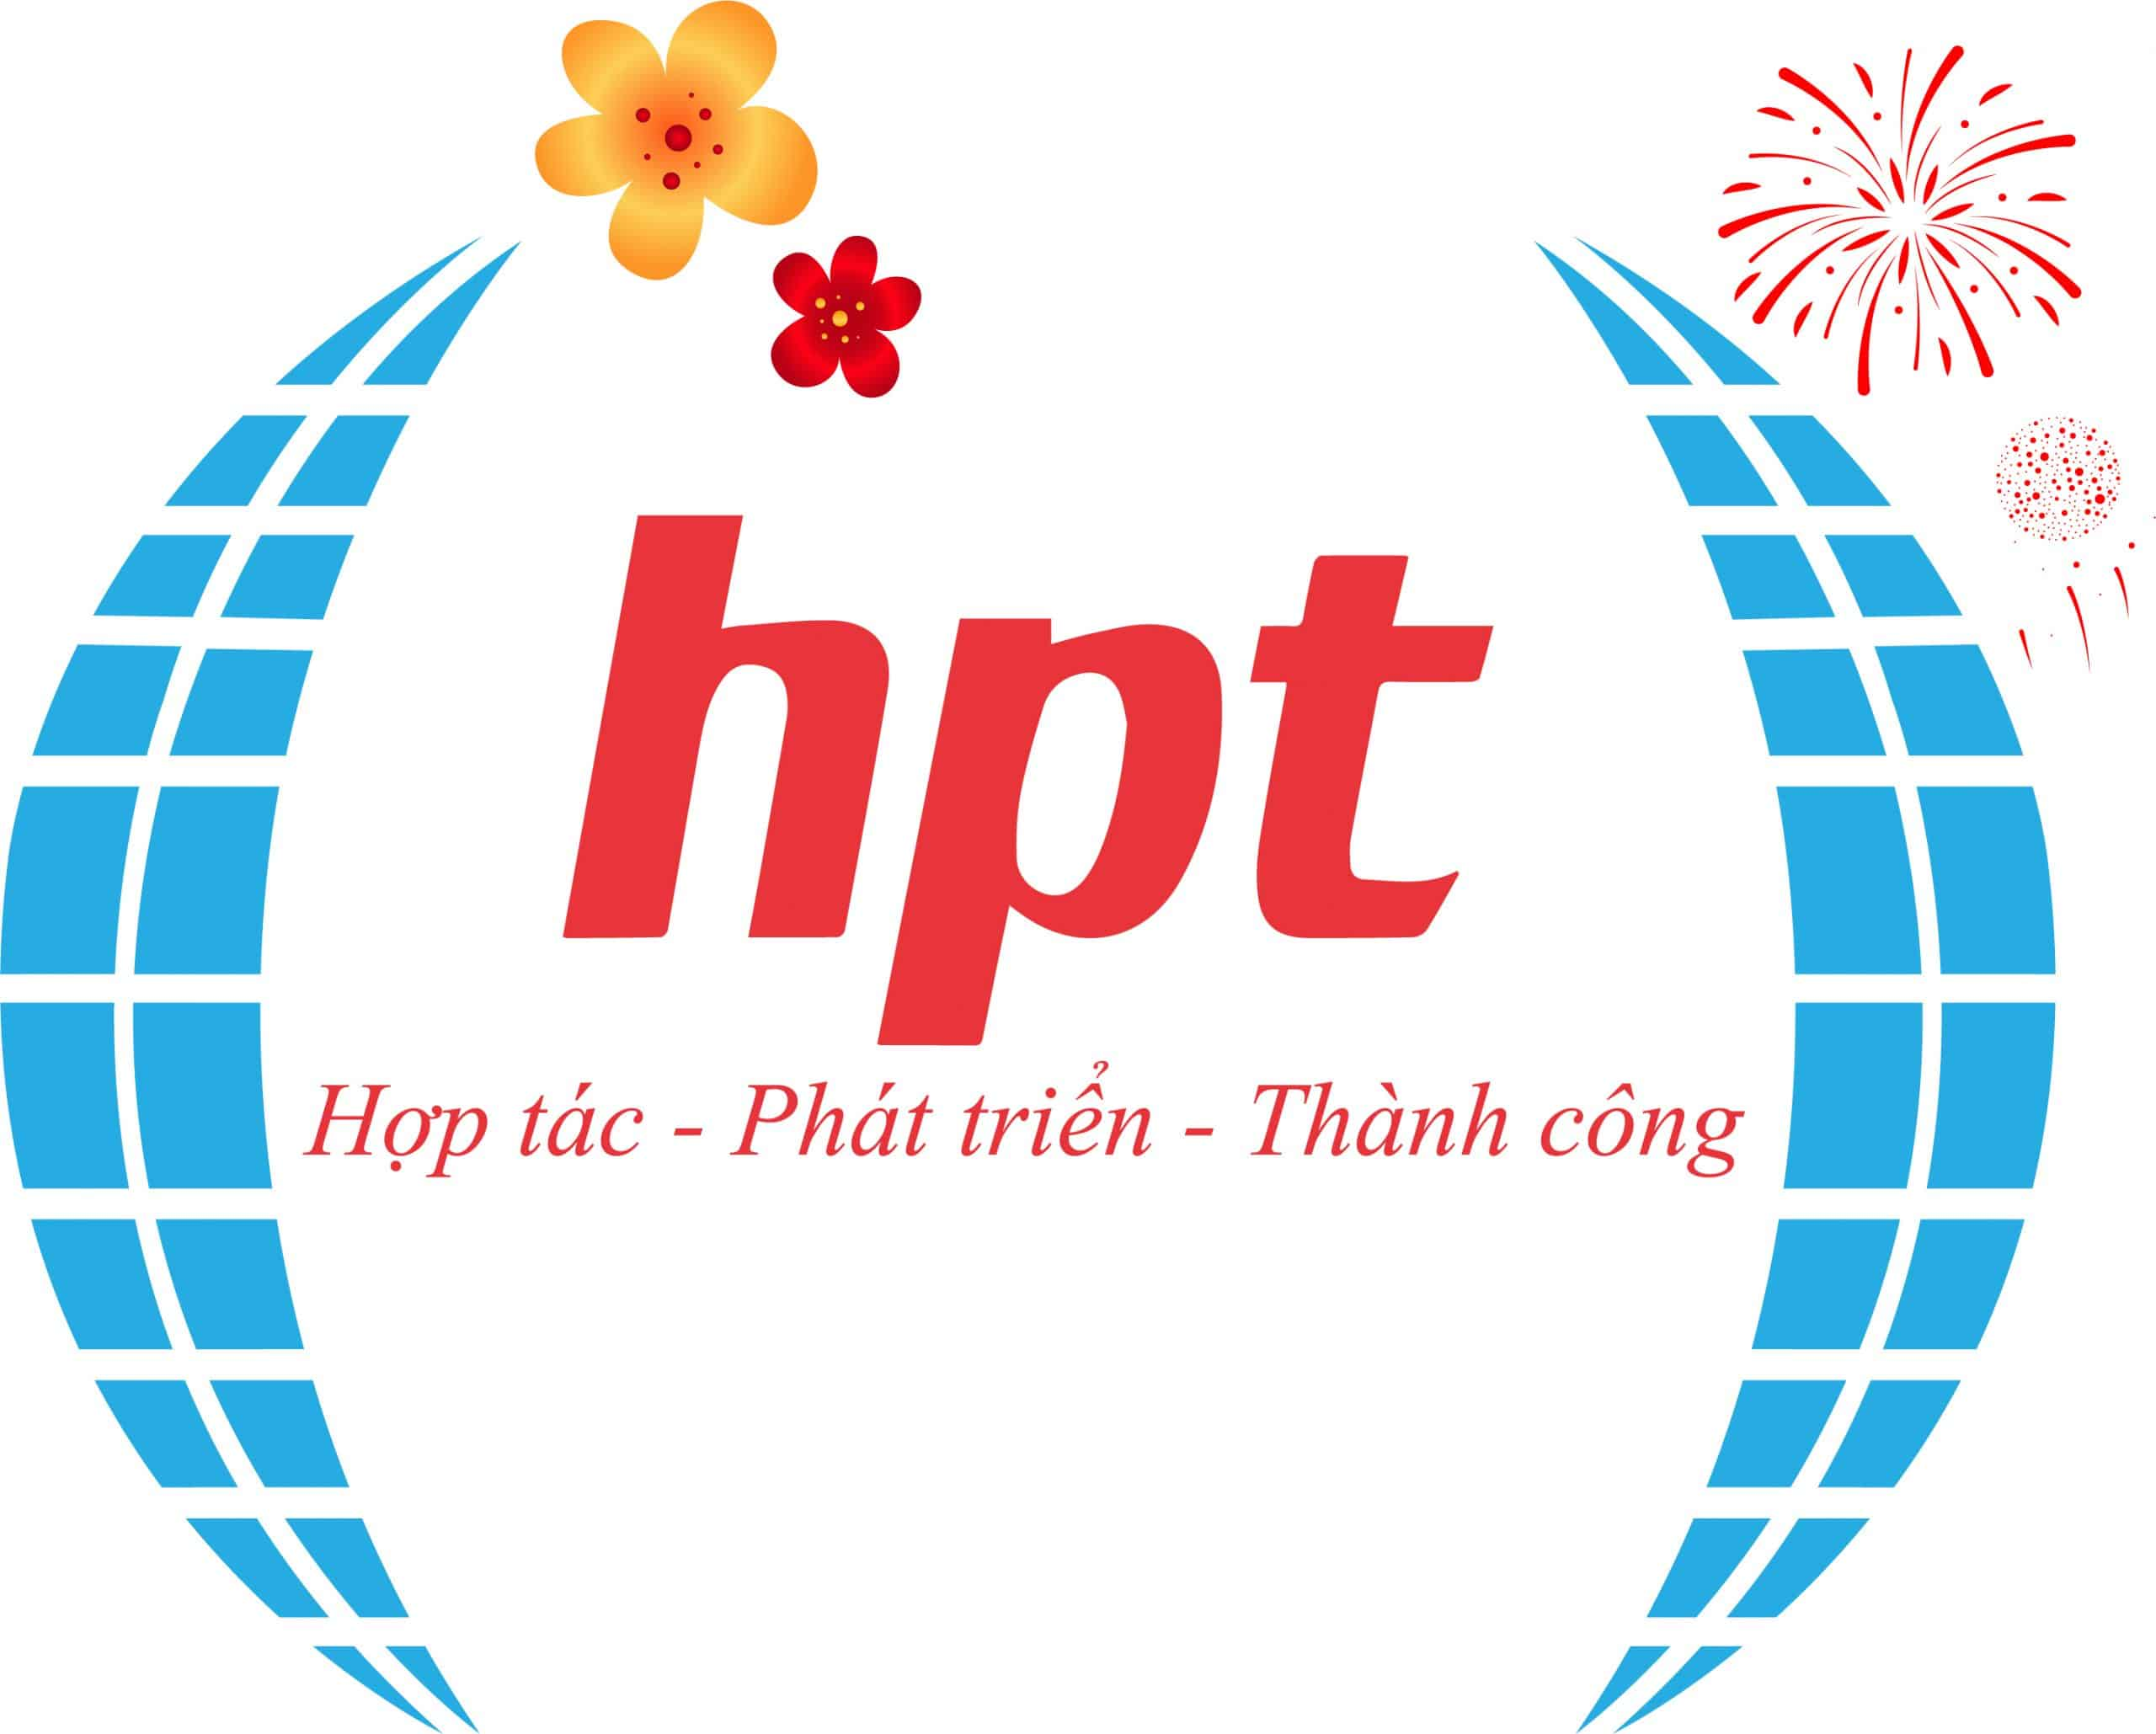 Camera quan sát HPT Việt Nam